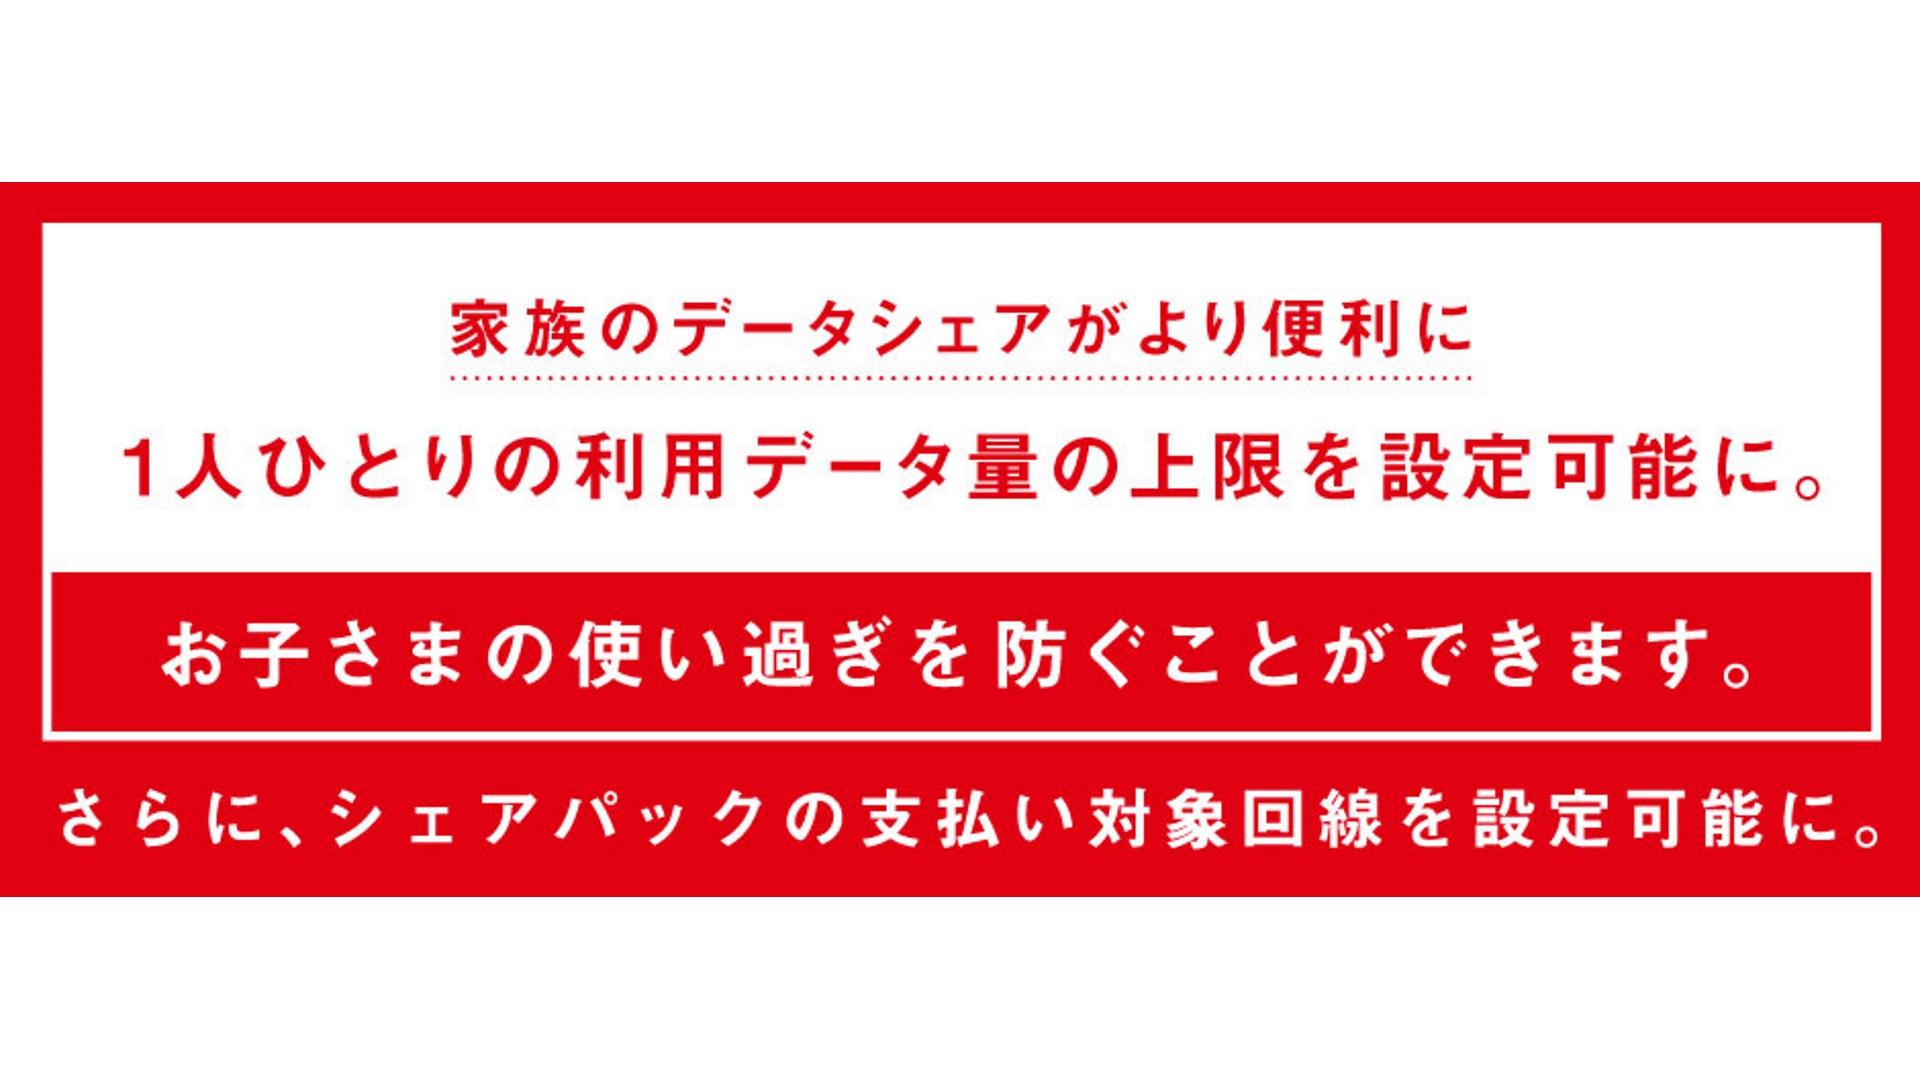 NTTドコモ、9月1日から「シェアパック」で個別上限を設定可能に